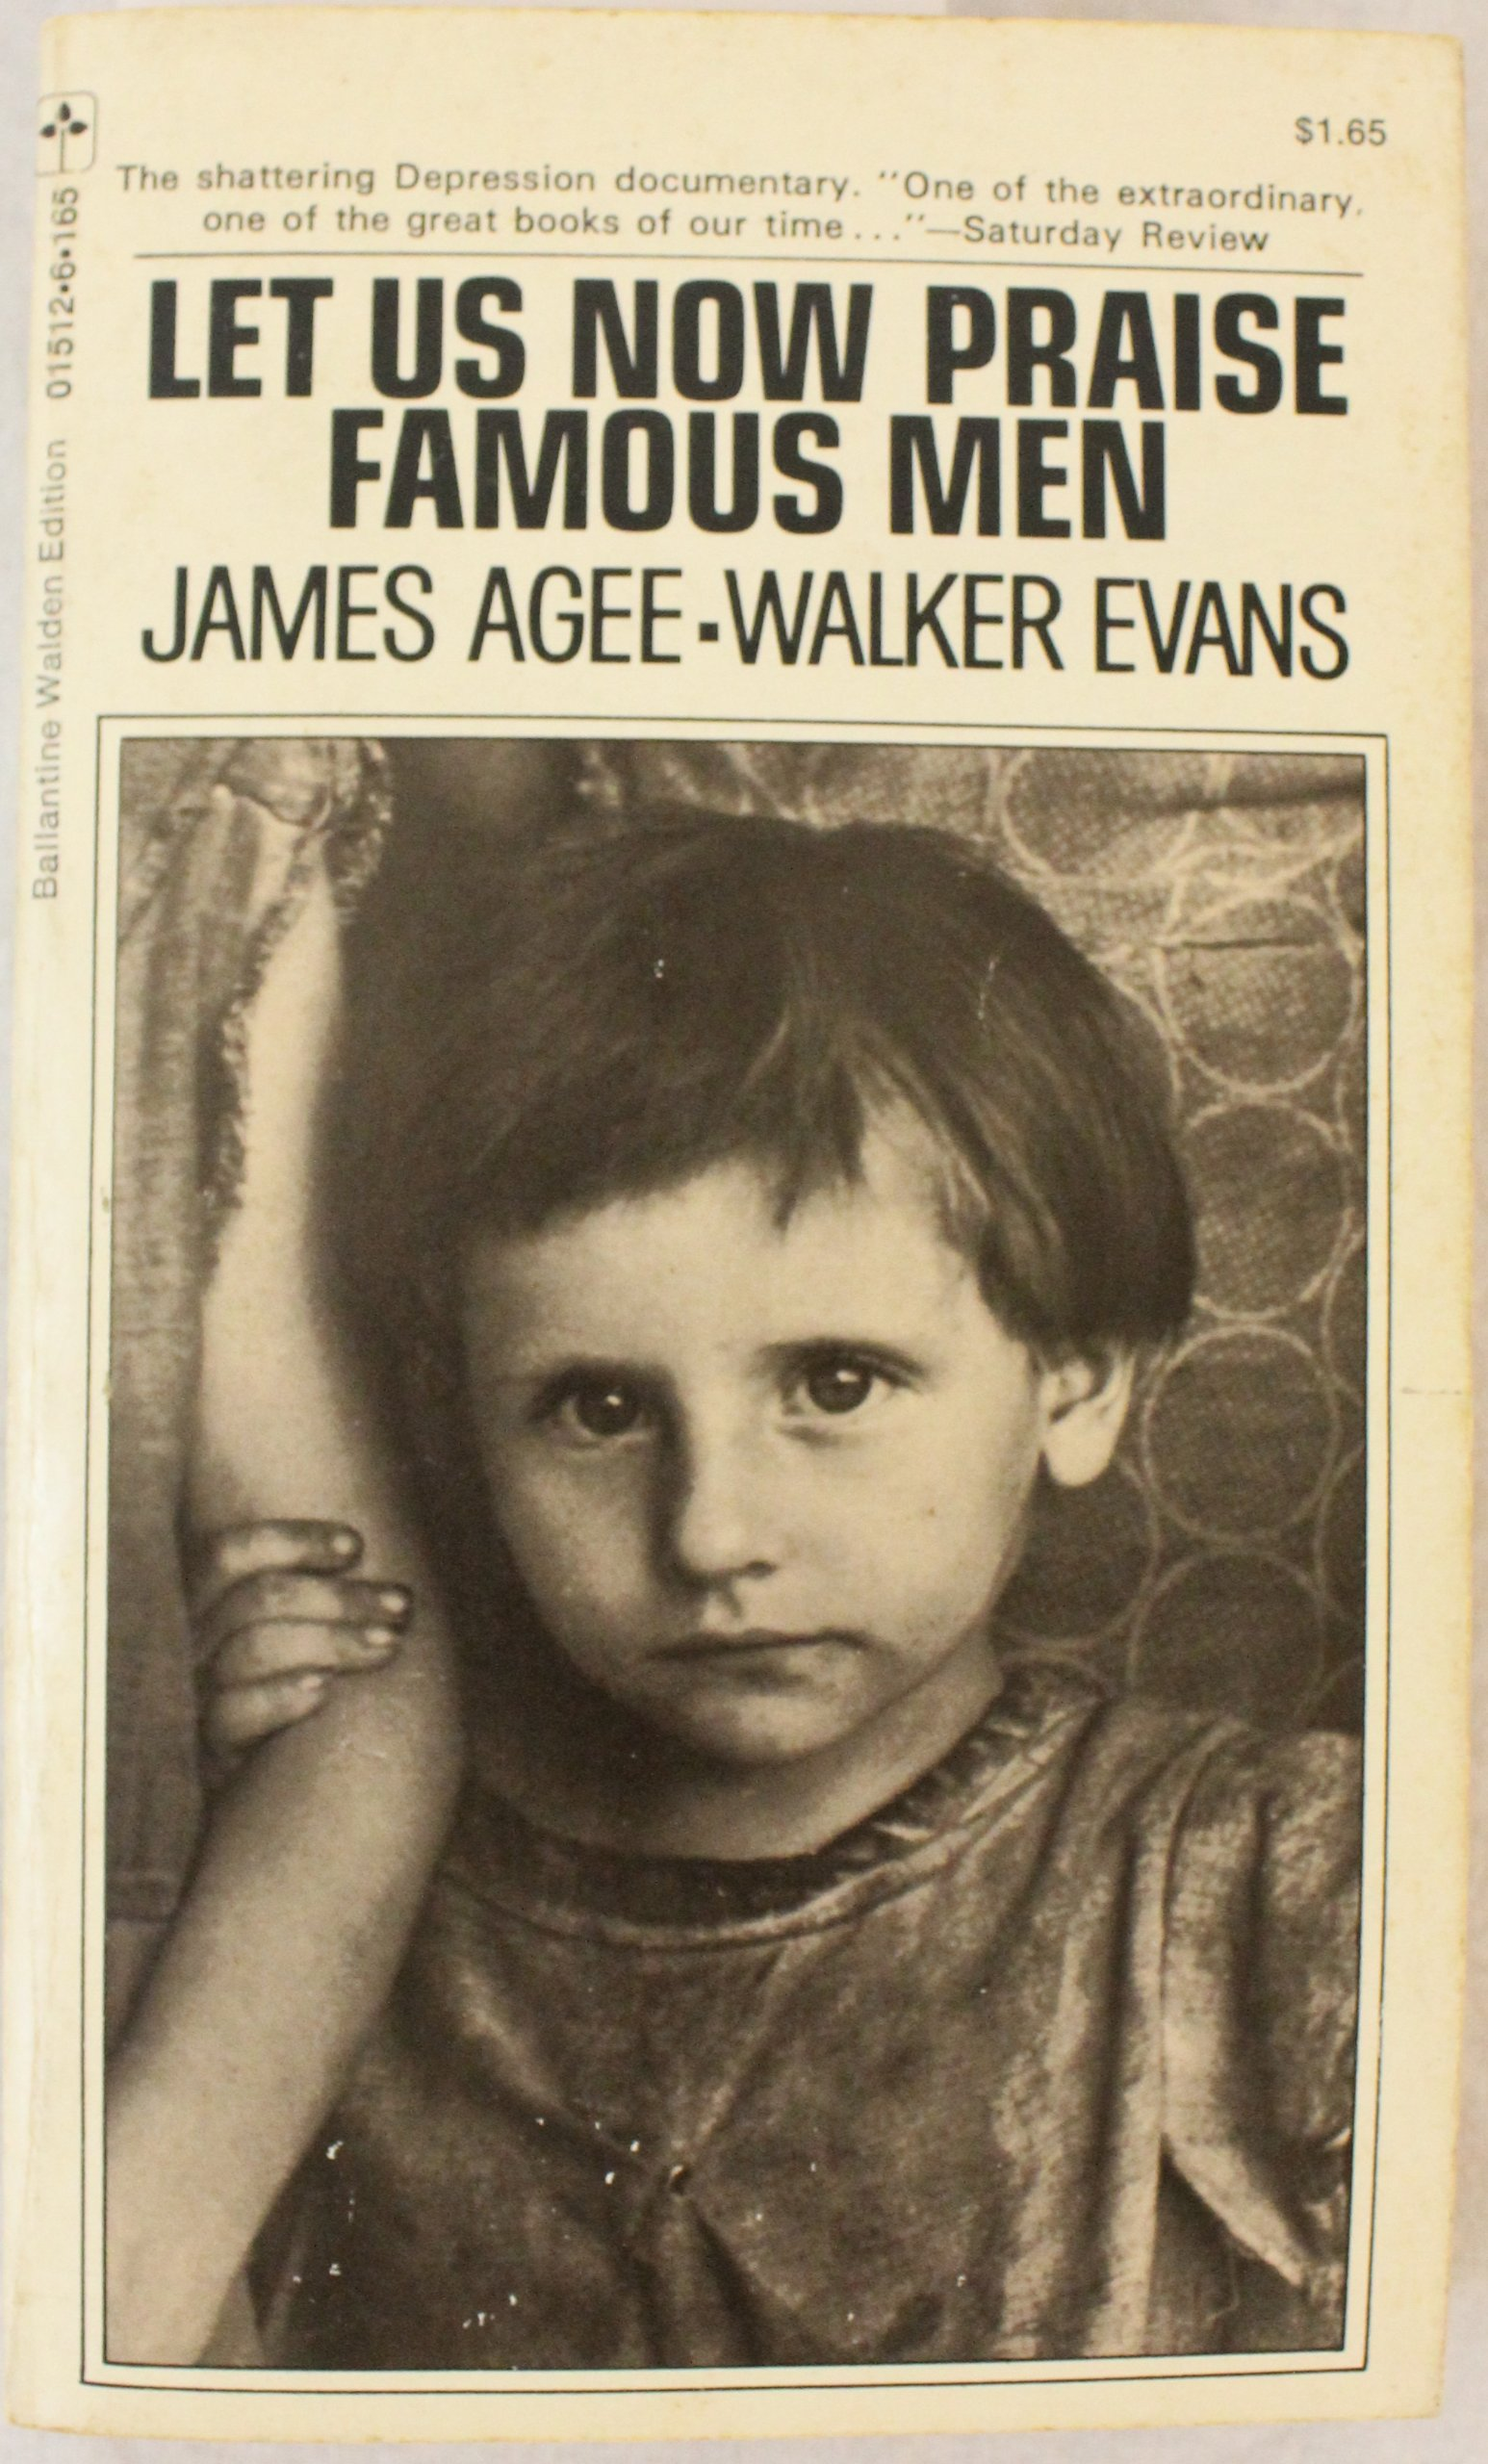 Image result for let us now praise famous men walker evans james agee